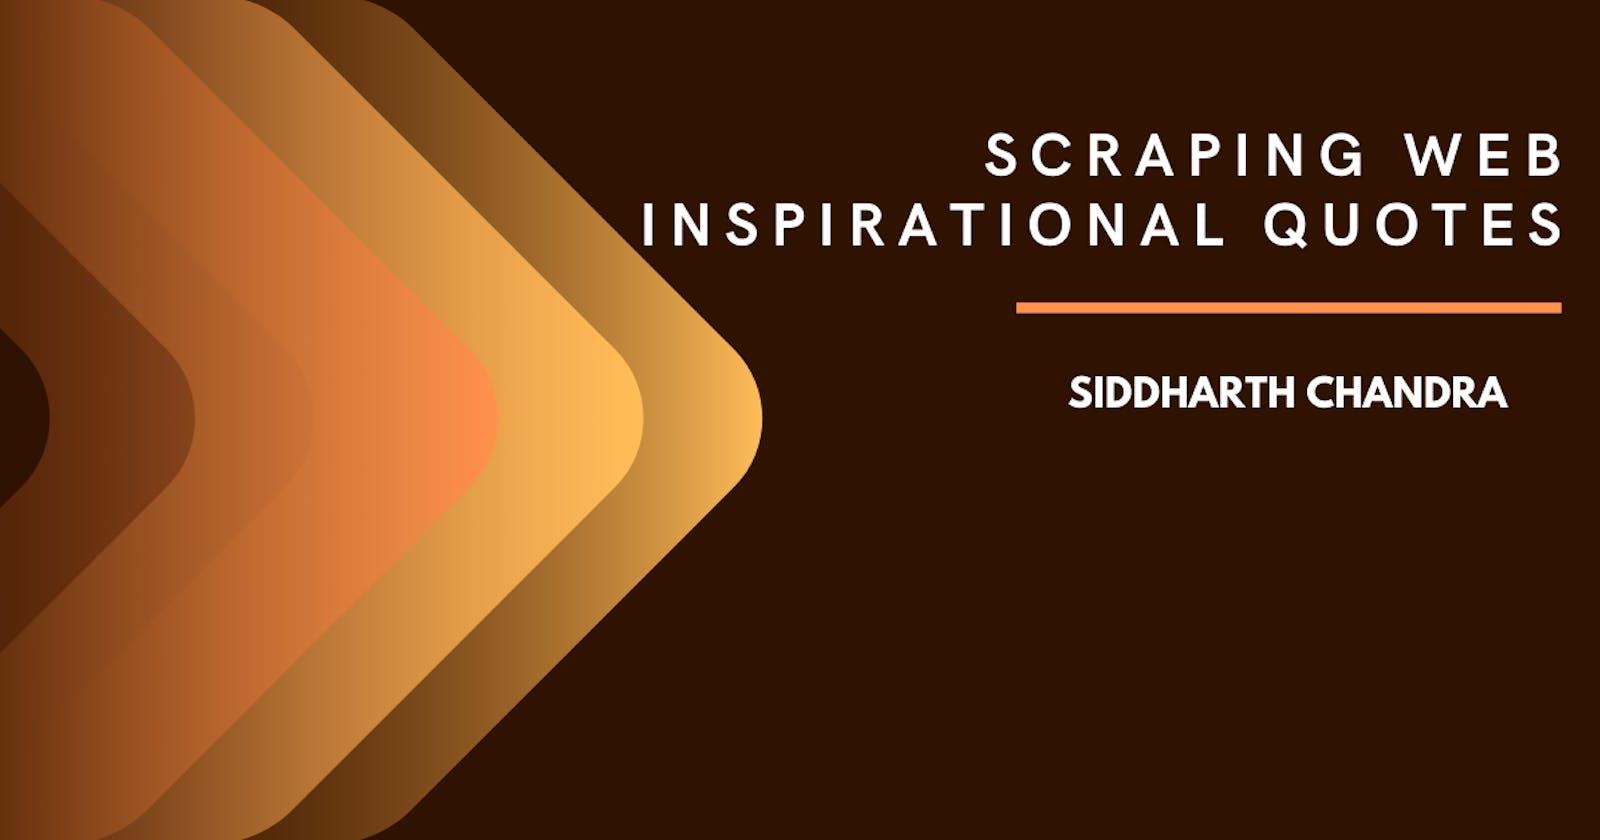 Scraping Web - Inspiring Quotes